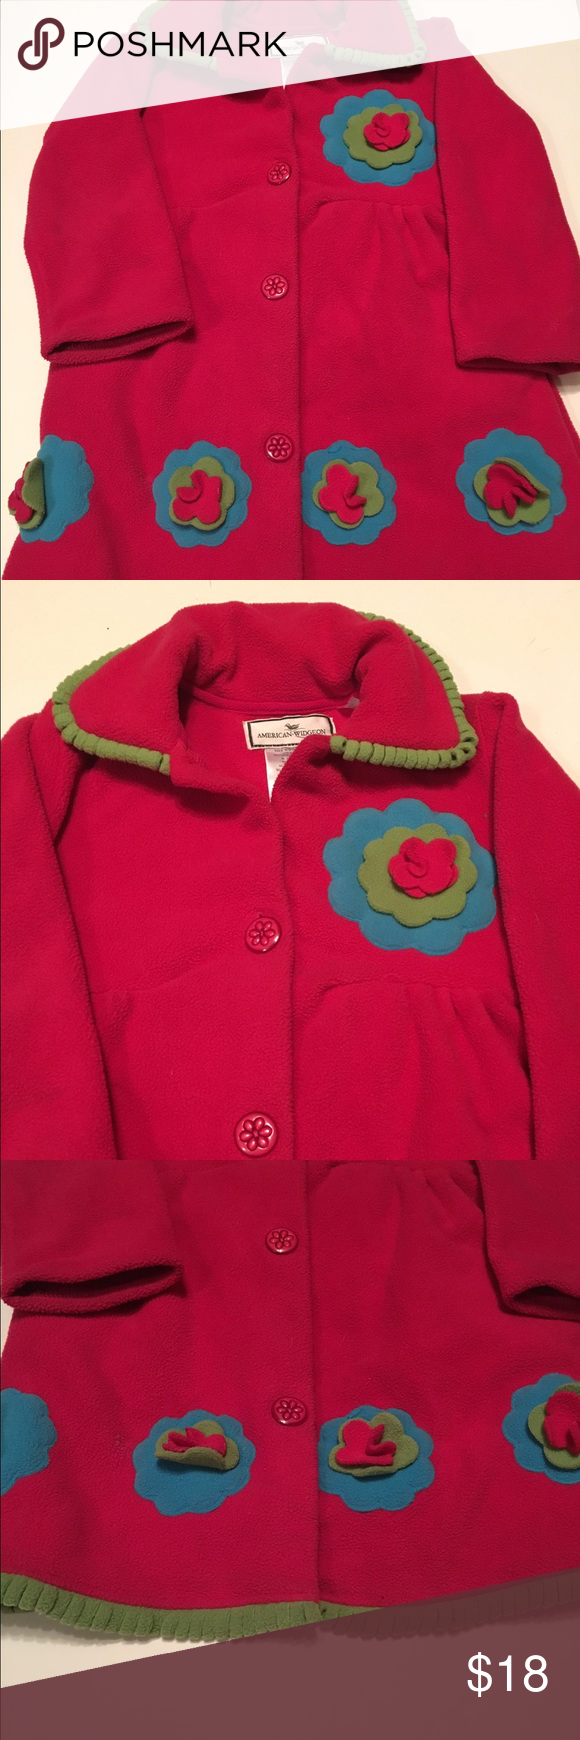 Sweet Jacket in girls size 6 Beautiful pink jacket with flowers American Widgeon Jackets & Coats Pea Coats